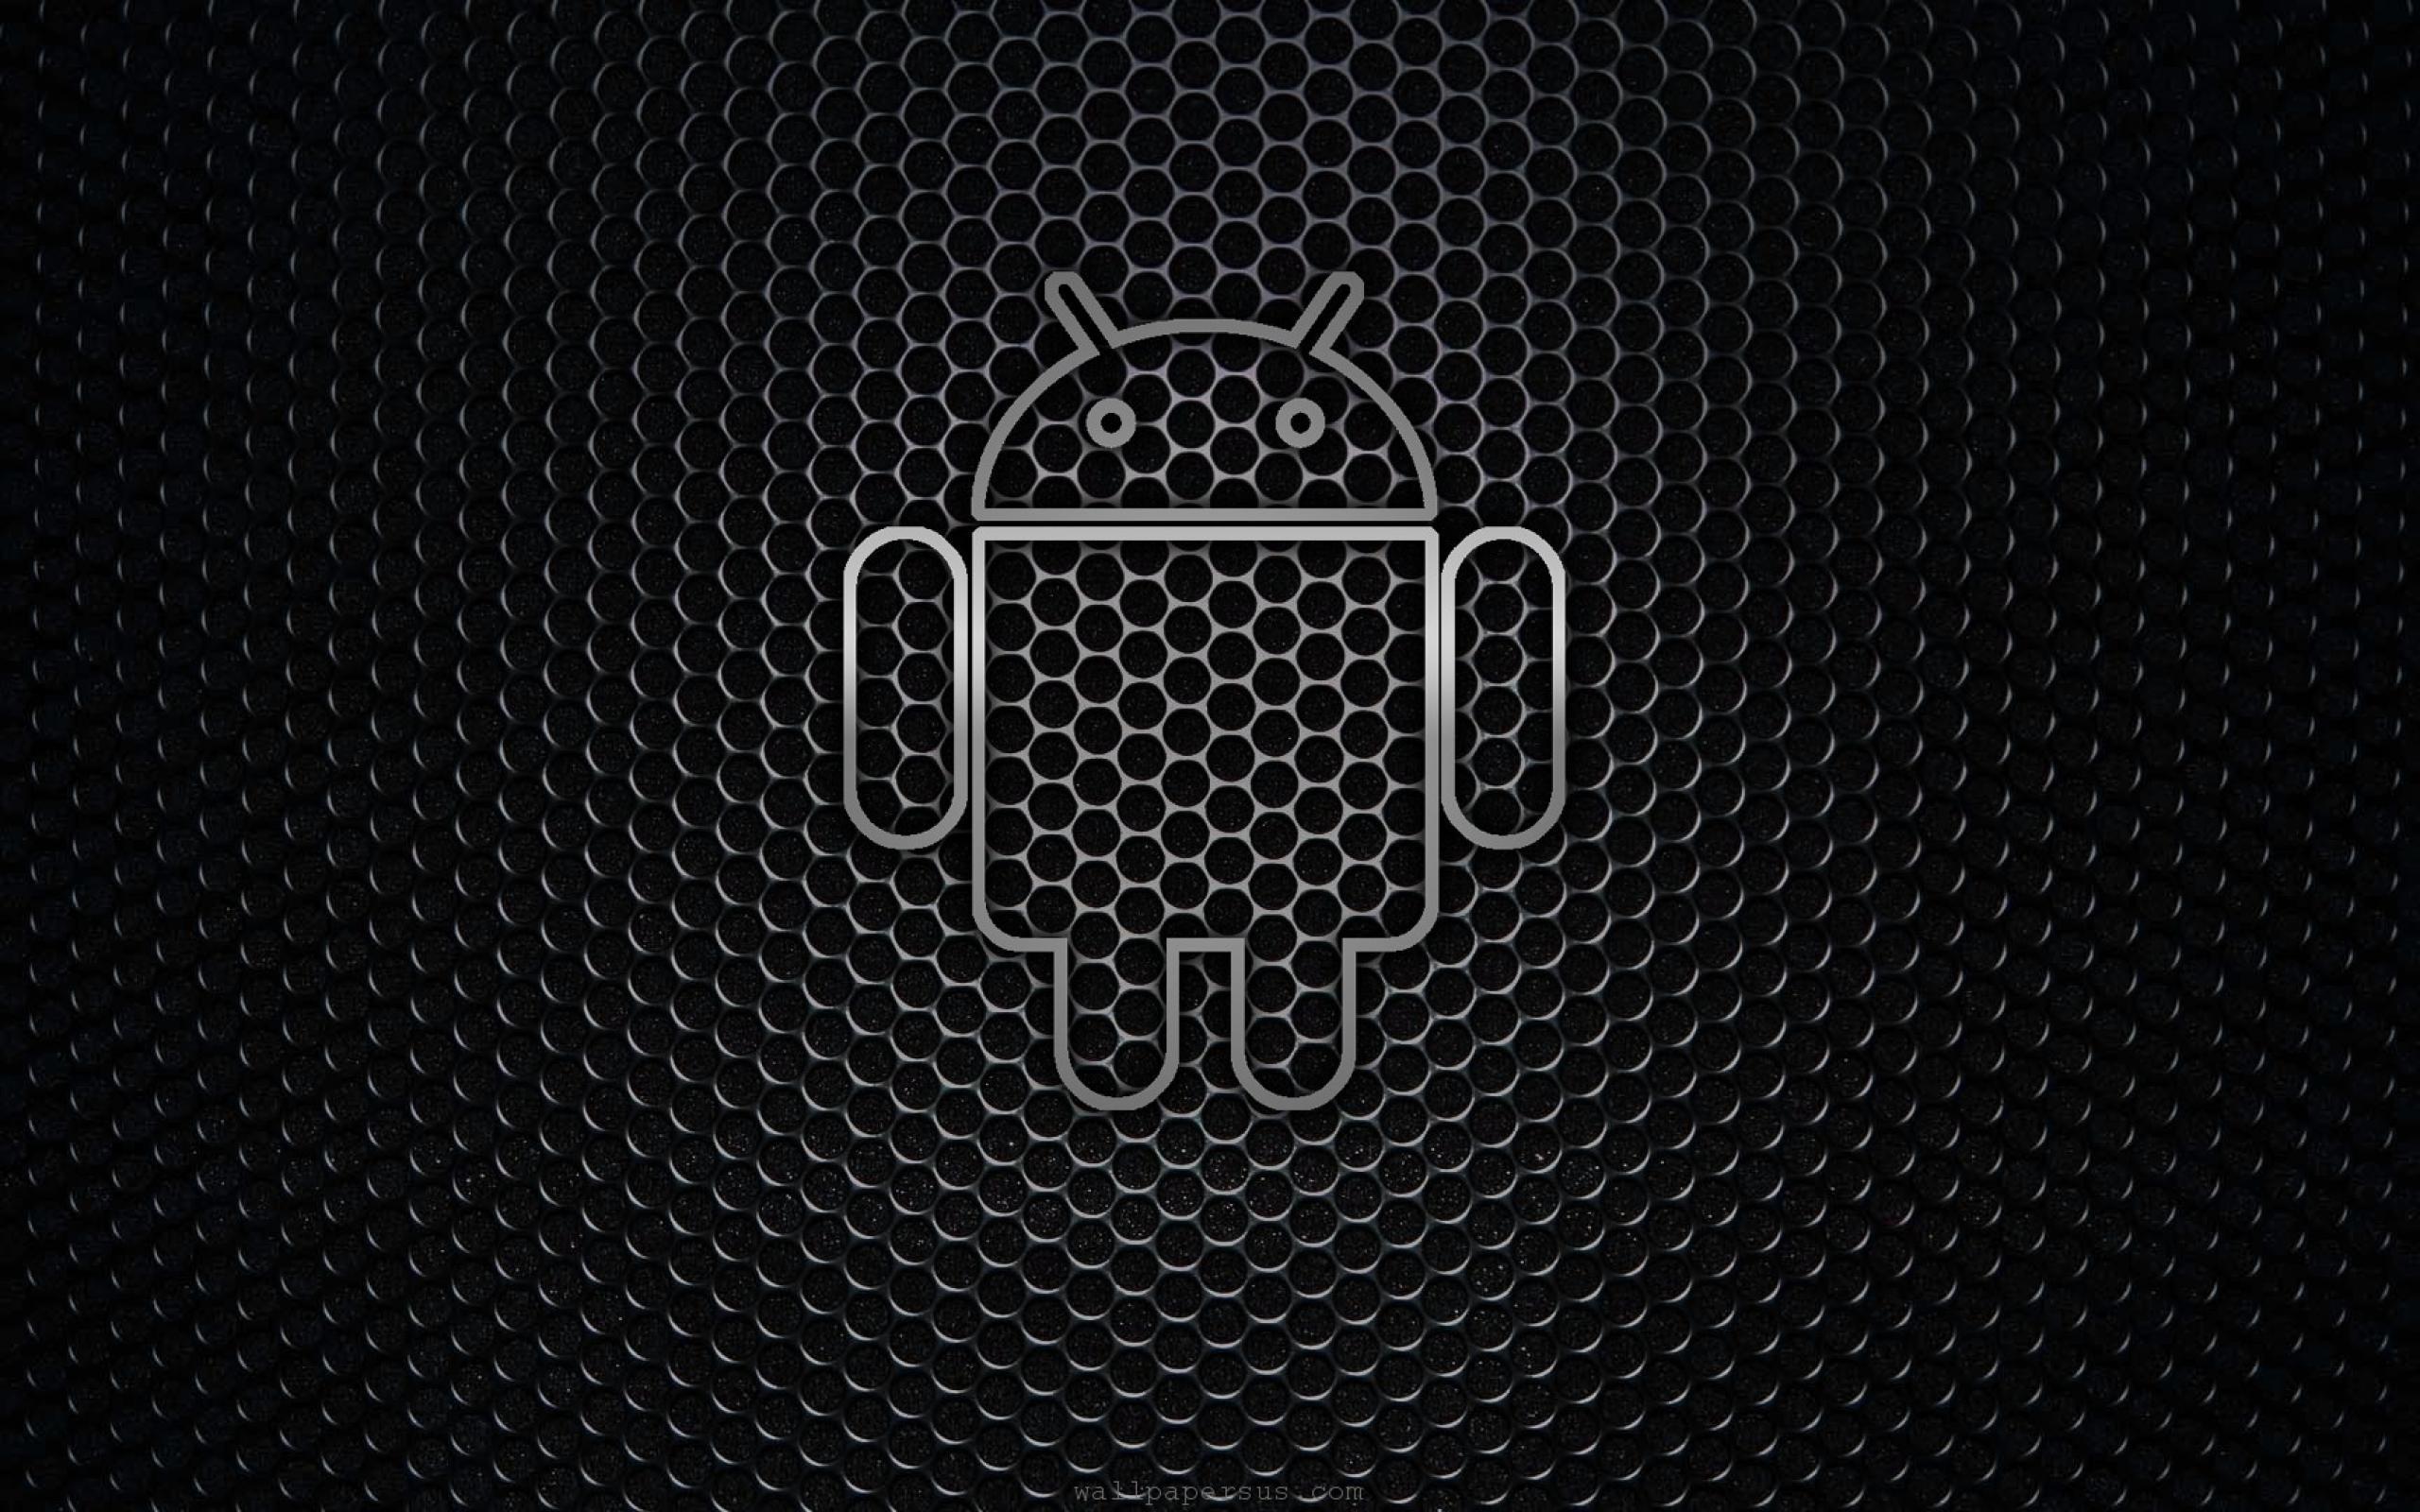 imageswallpaperloftcom1020122560x1600 android logo blackjpg 2560x1600